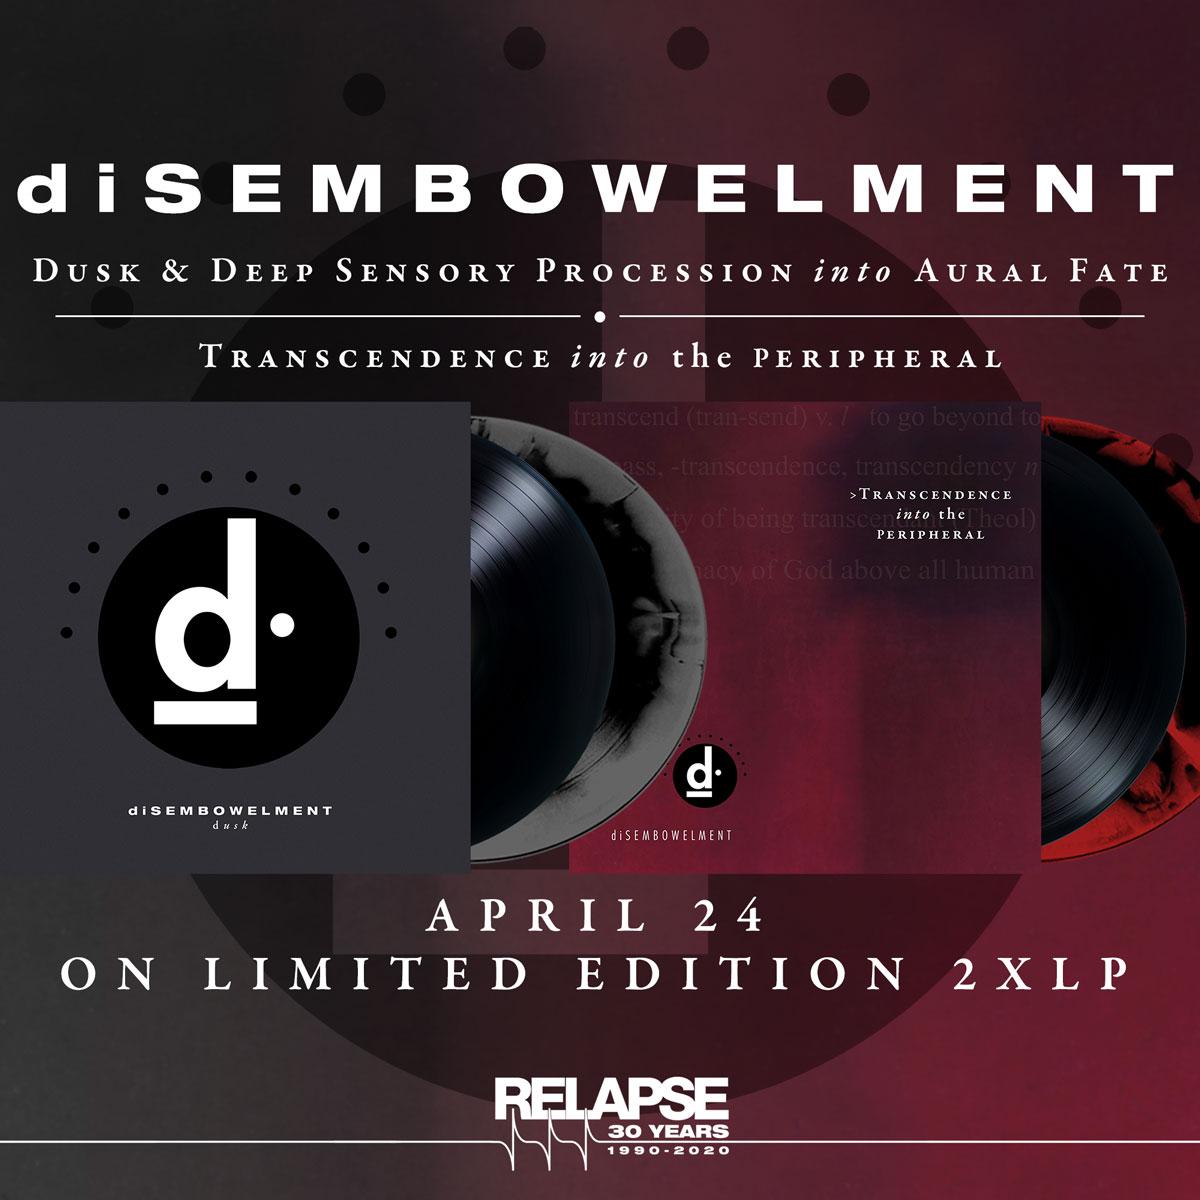 disembowelment-doom-metal-death-metal-vinyl-relapse